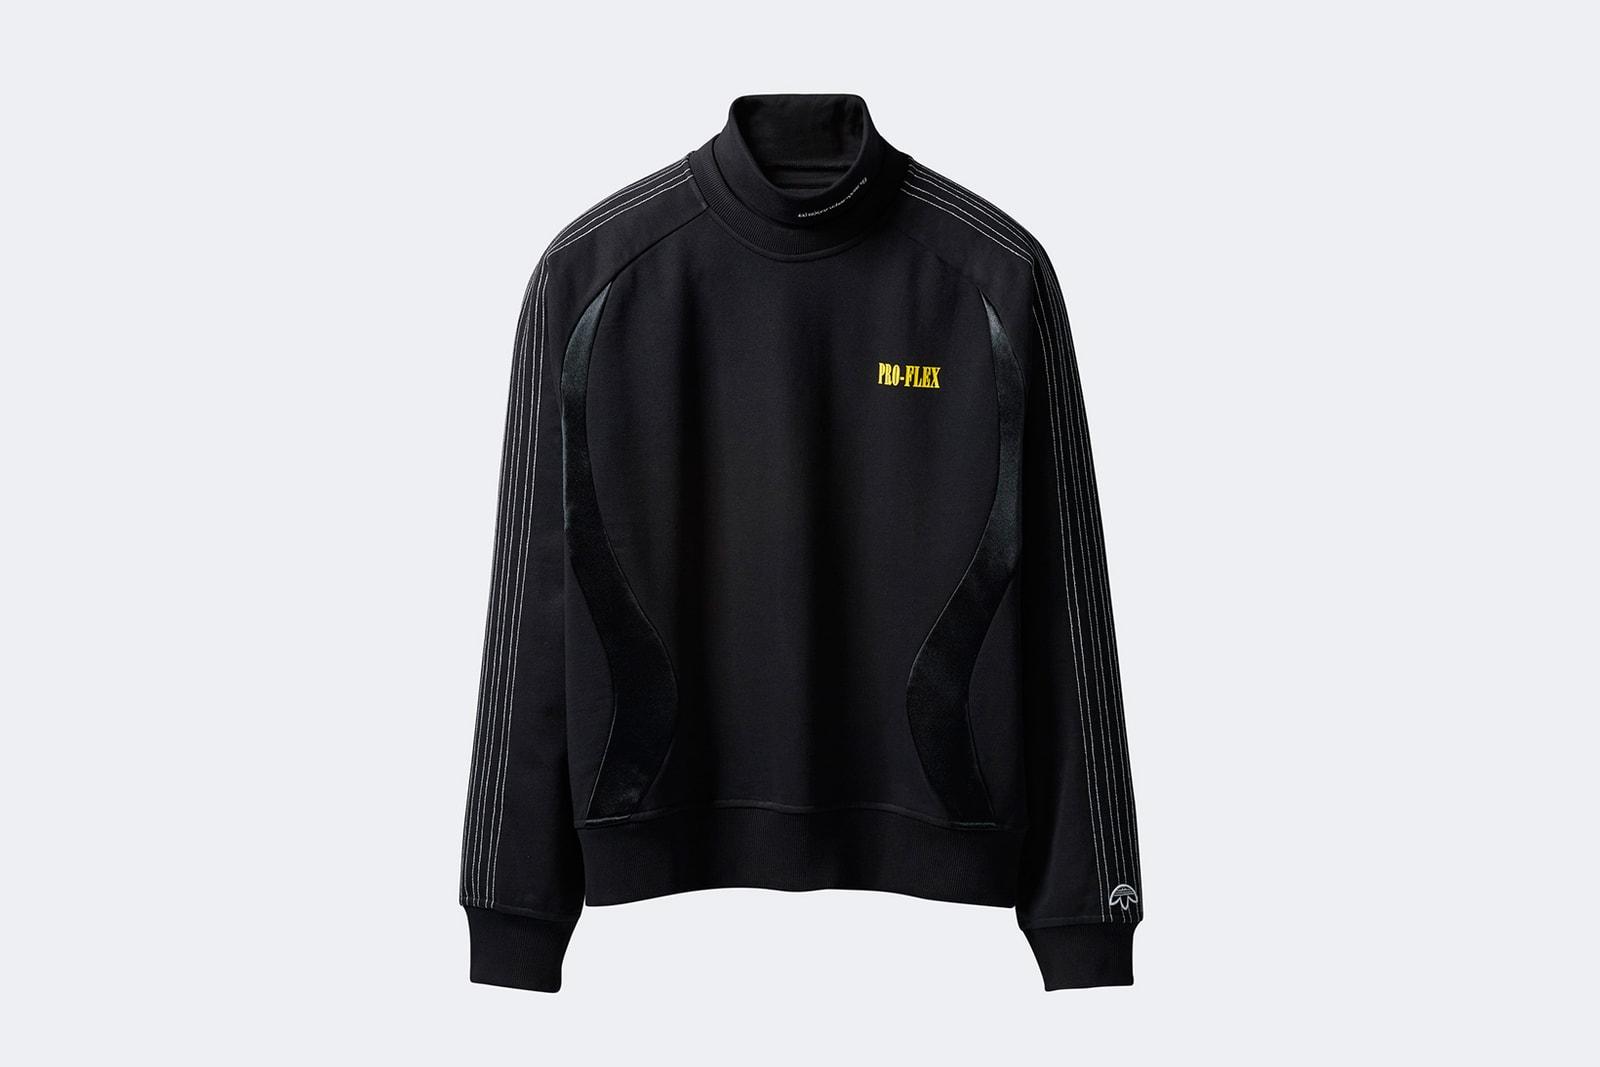 alexander wang adidas originals season 5 bball sneaker 80s club nostalgia